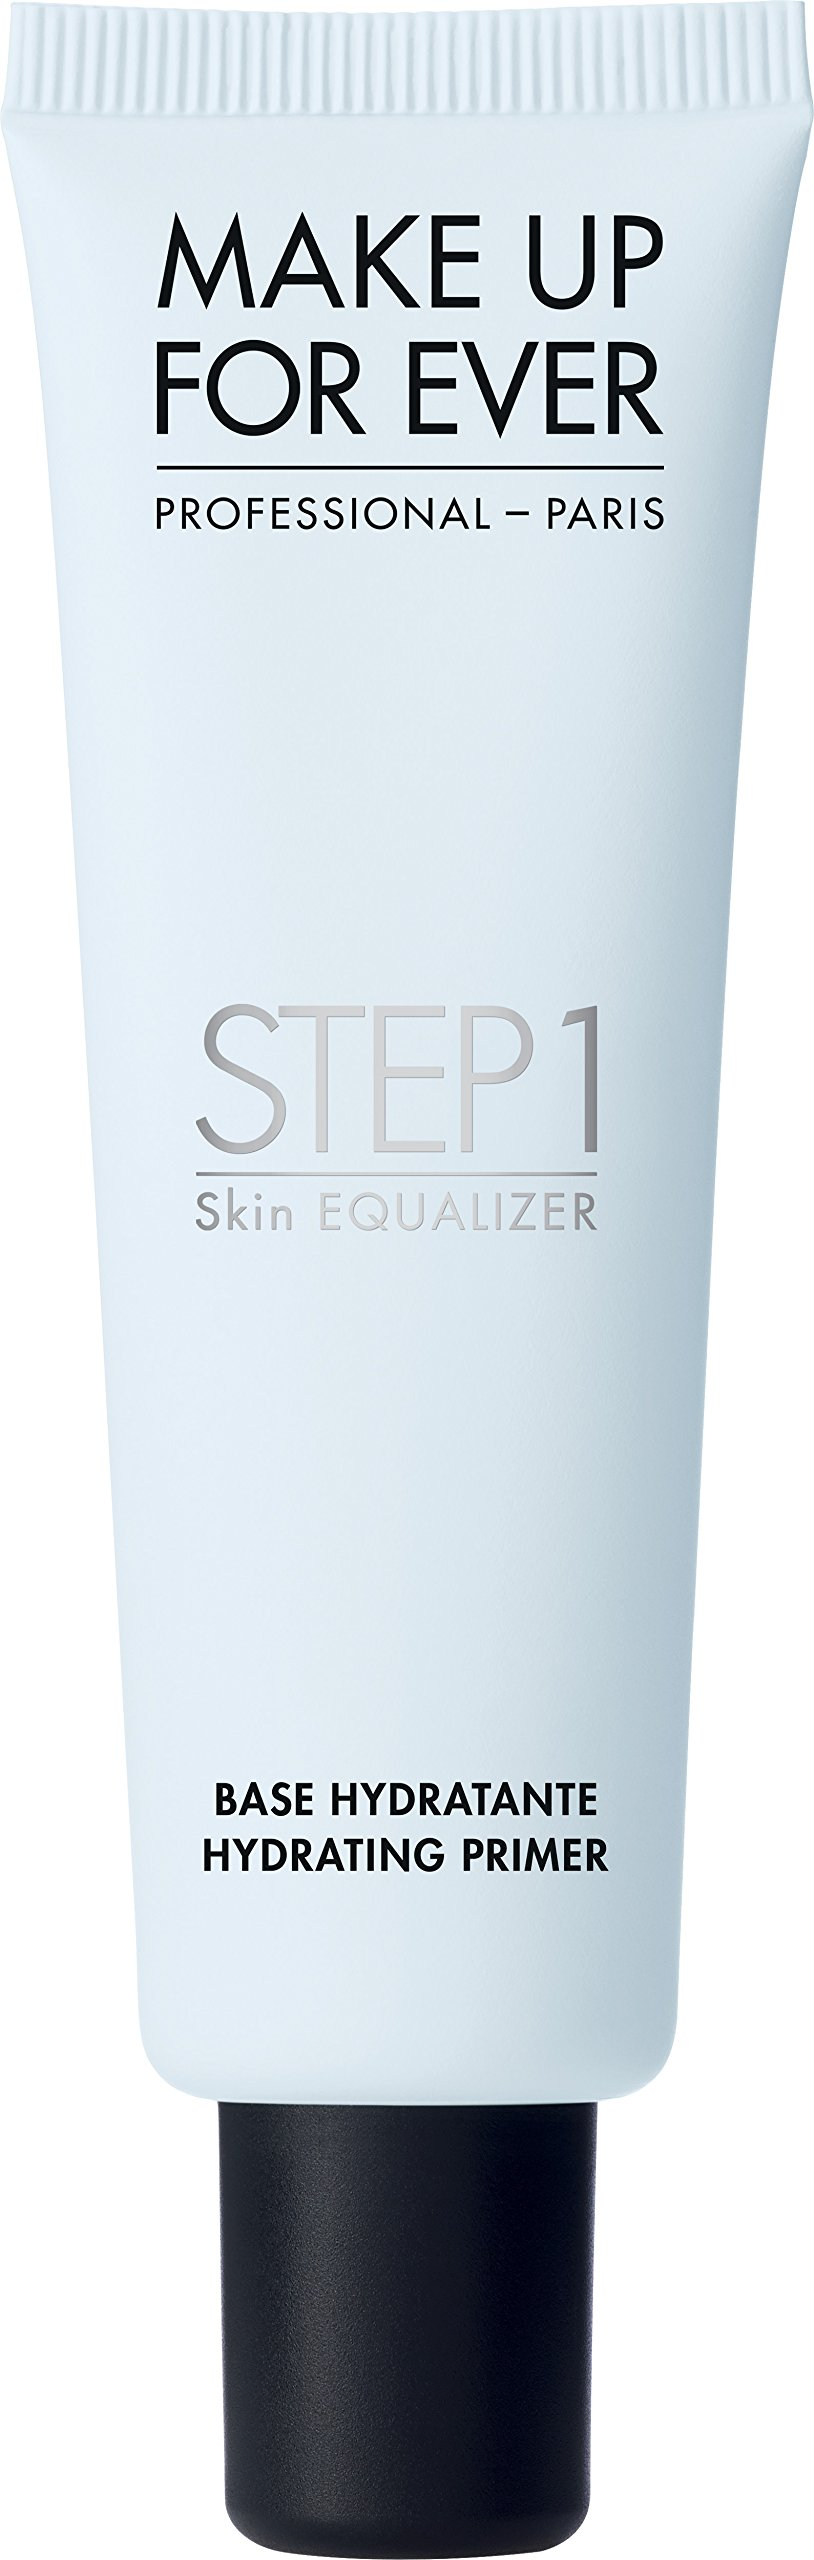 Make Up For Ever Step 1 Skin Equalizer, No. 3 Hydrating Primer, 1 Ounce